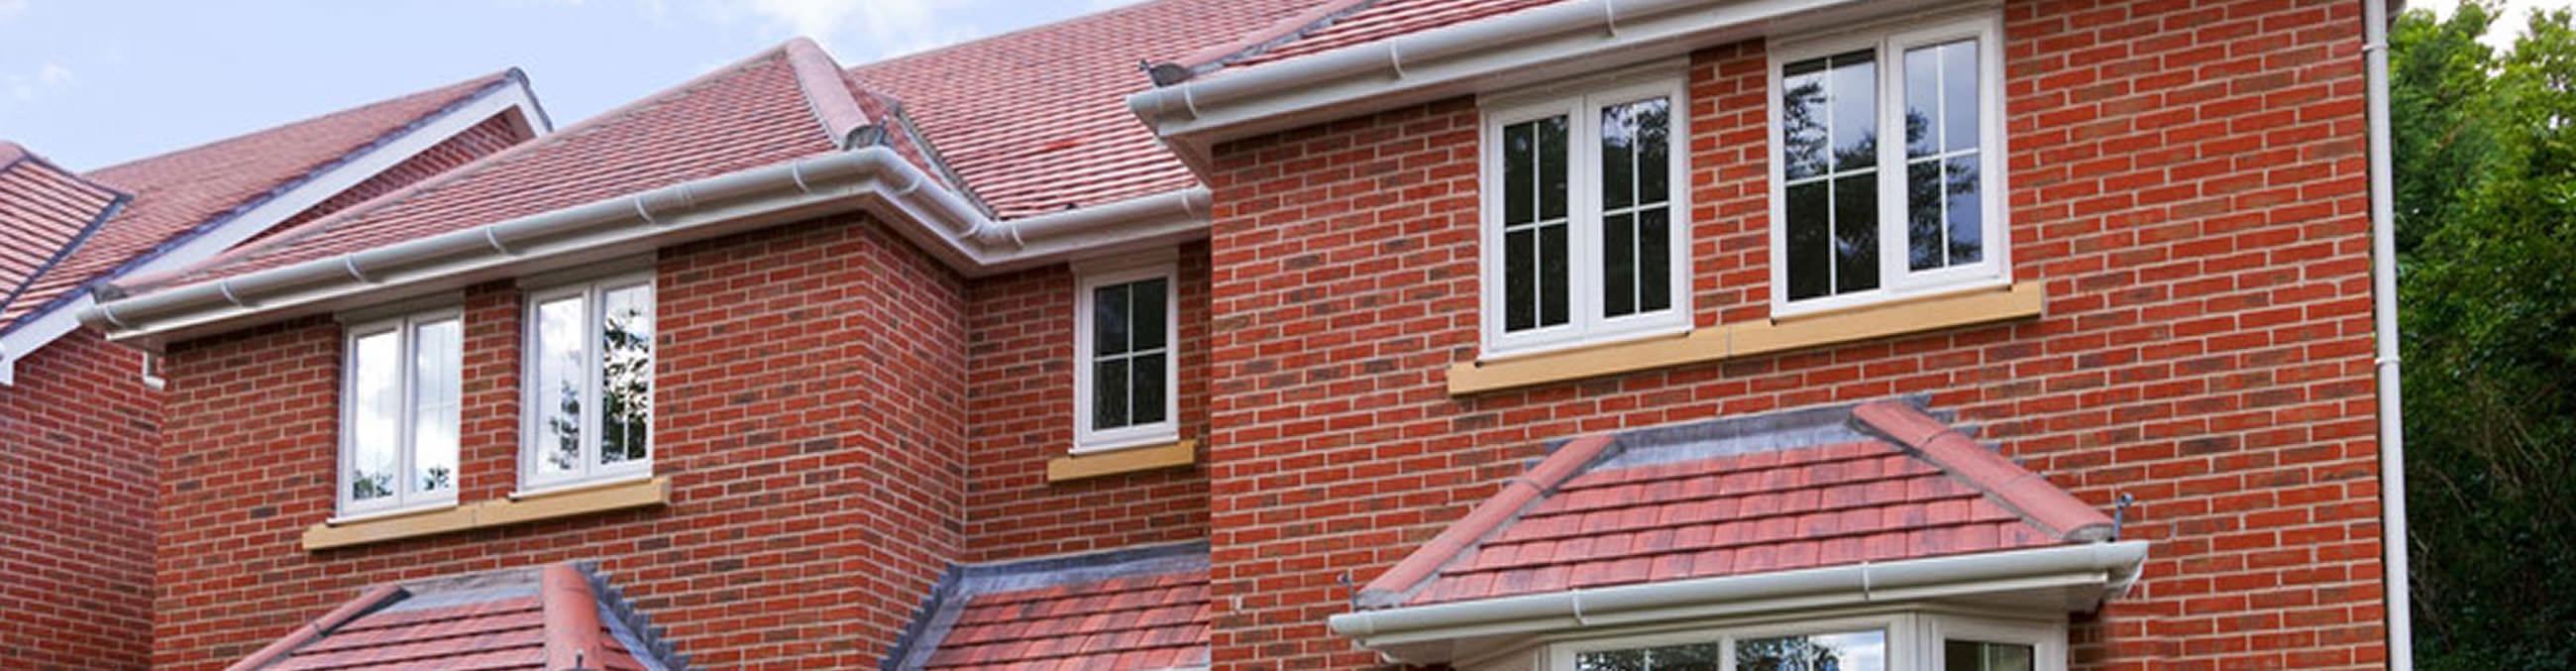 uPVC French Casement Windows Milton Keynes